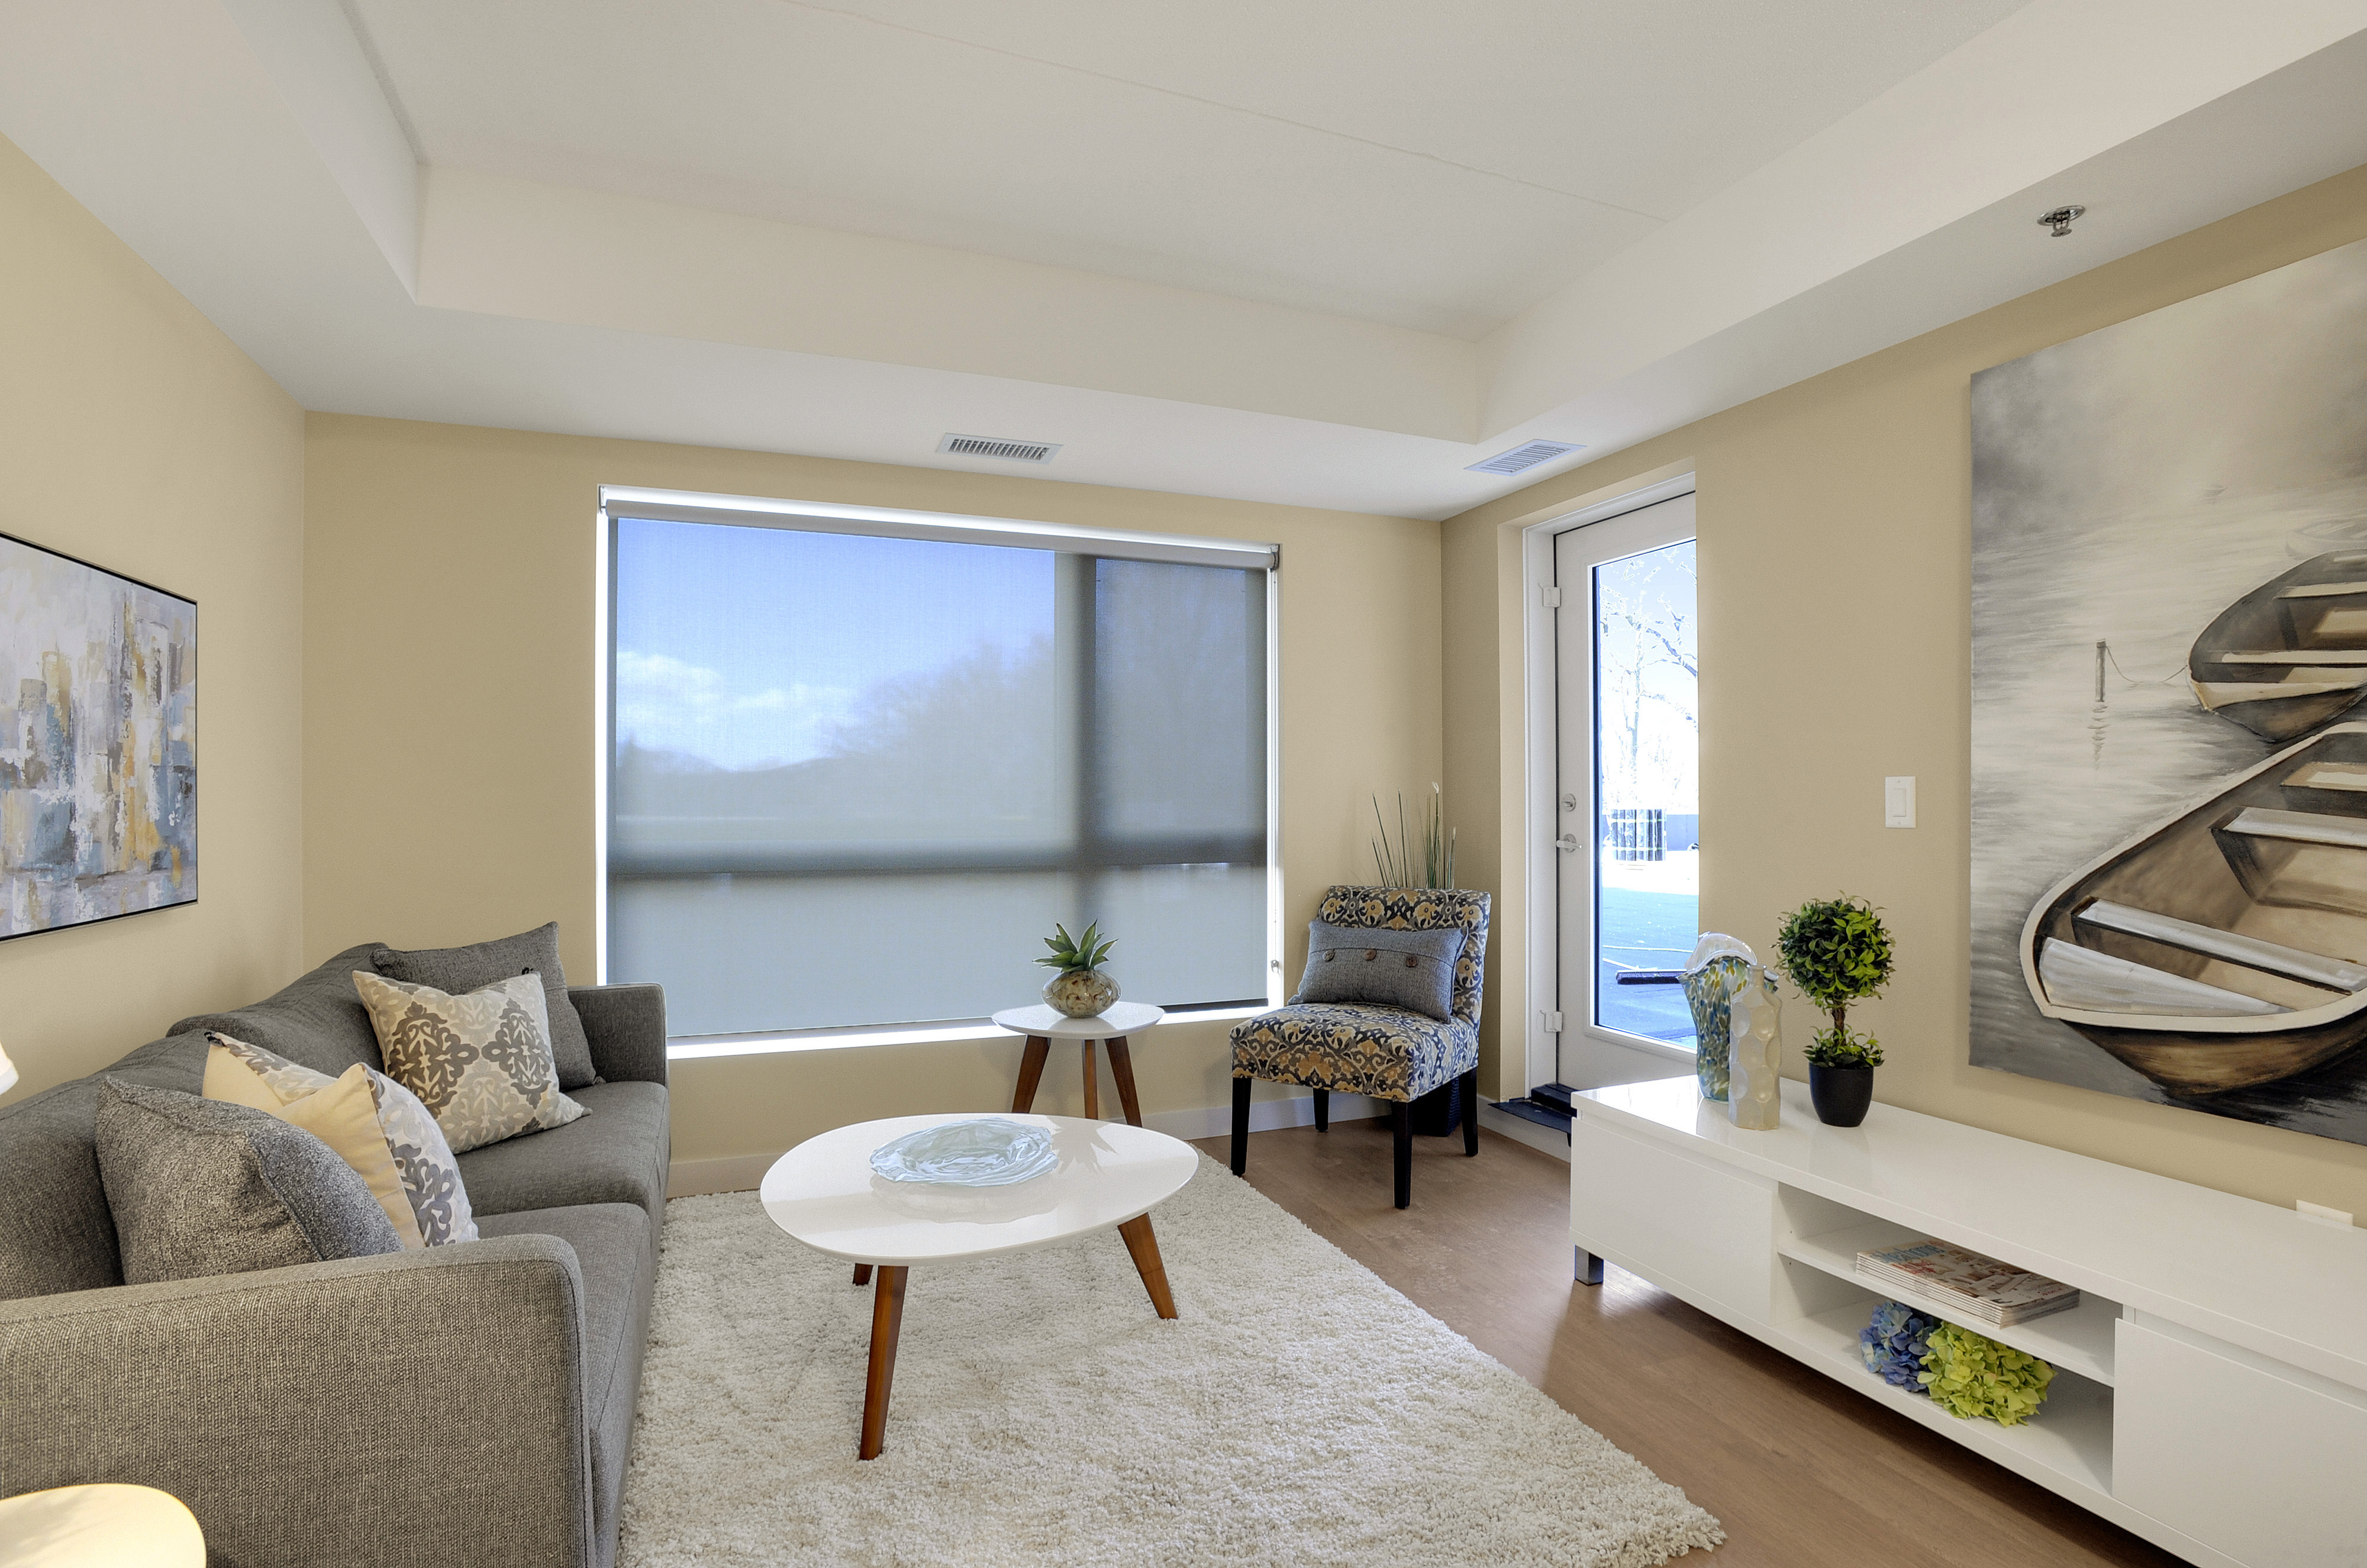 50 Whellams Lane, Winnipeg, MB - $1,288